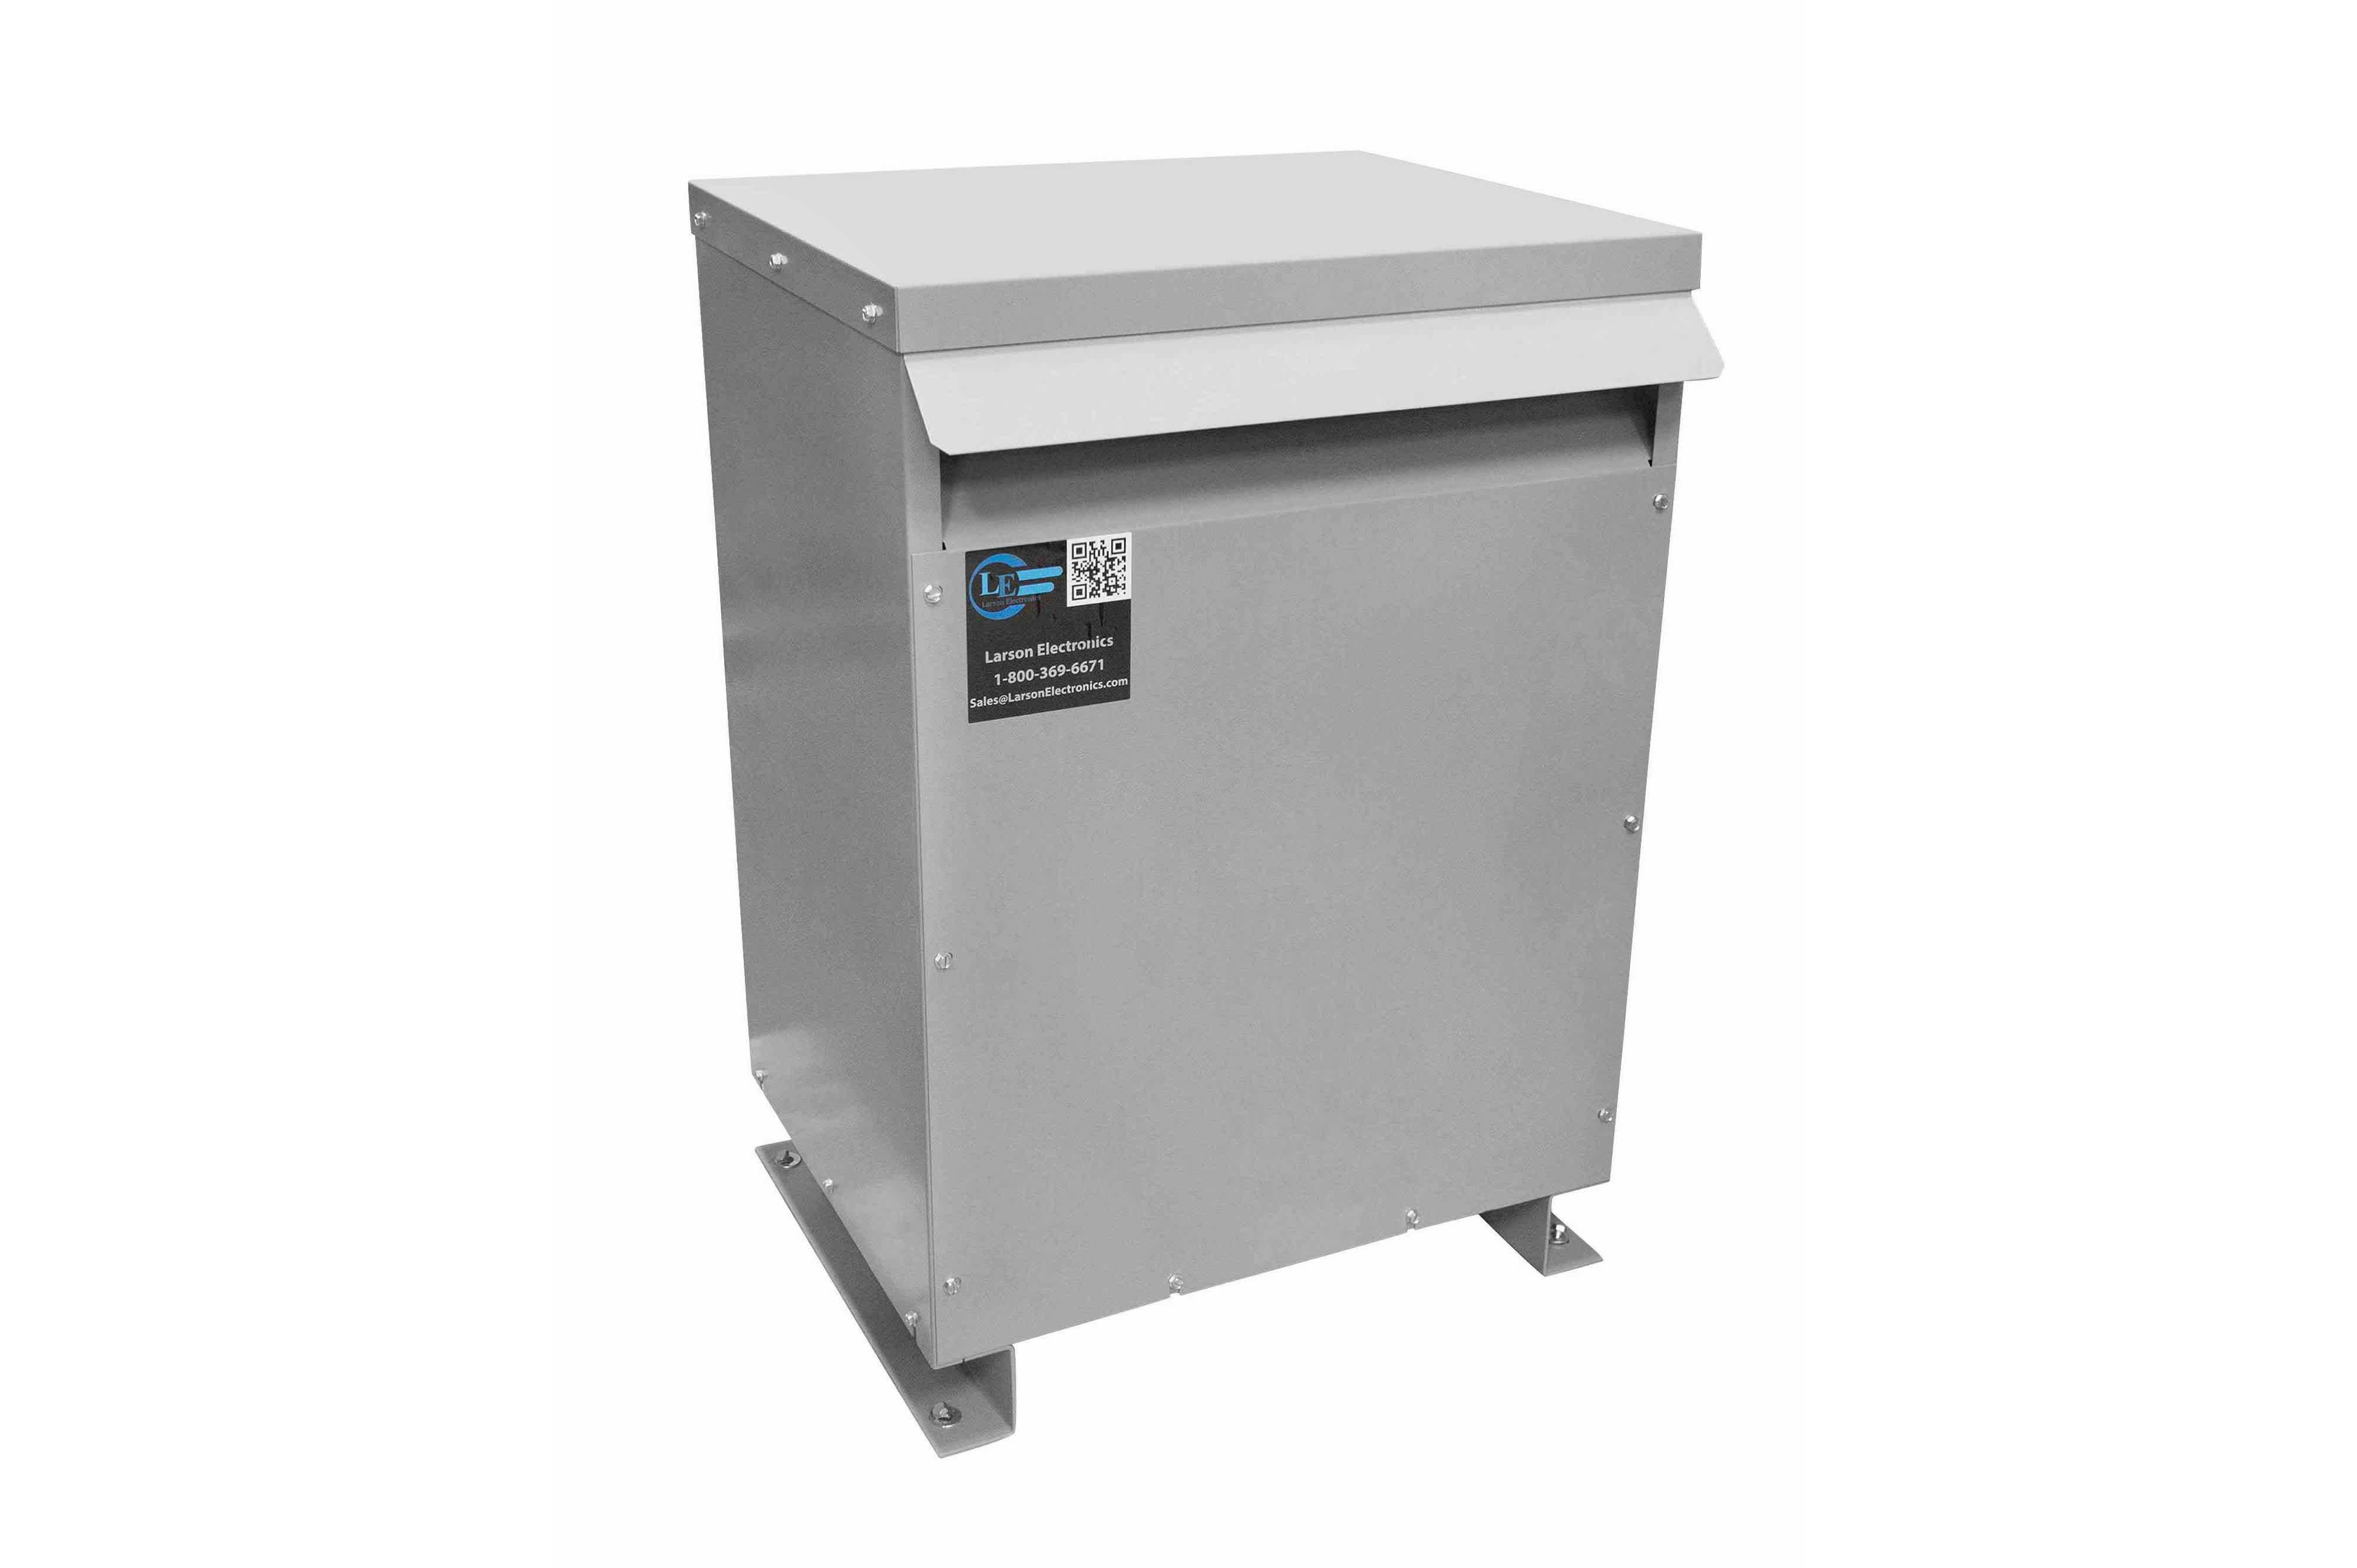 300 kVA 3PH Isolation Transformer, 240V Wye Primary, 480Y/277 Wye-N Secondary, N3R, Ventilated, 60 Hz